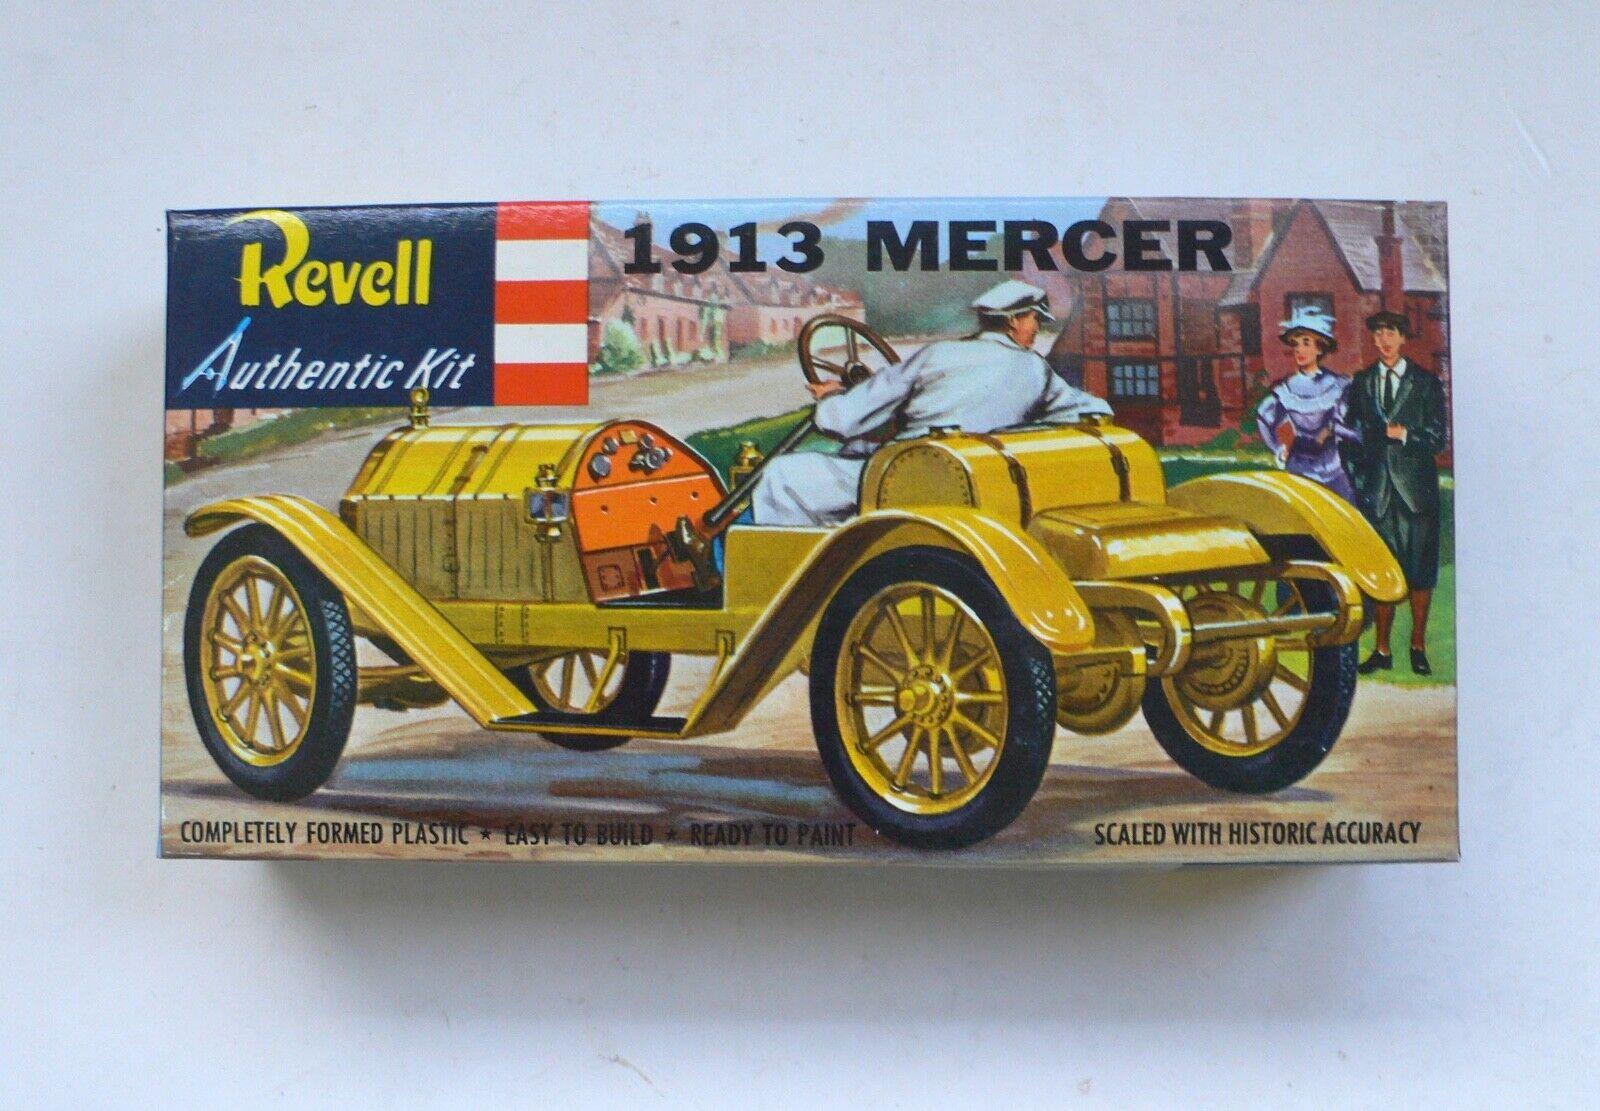 1950's Revell Authentic Kit 1913 MERCER CAR Model Kit MIB 1956 Great Britain